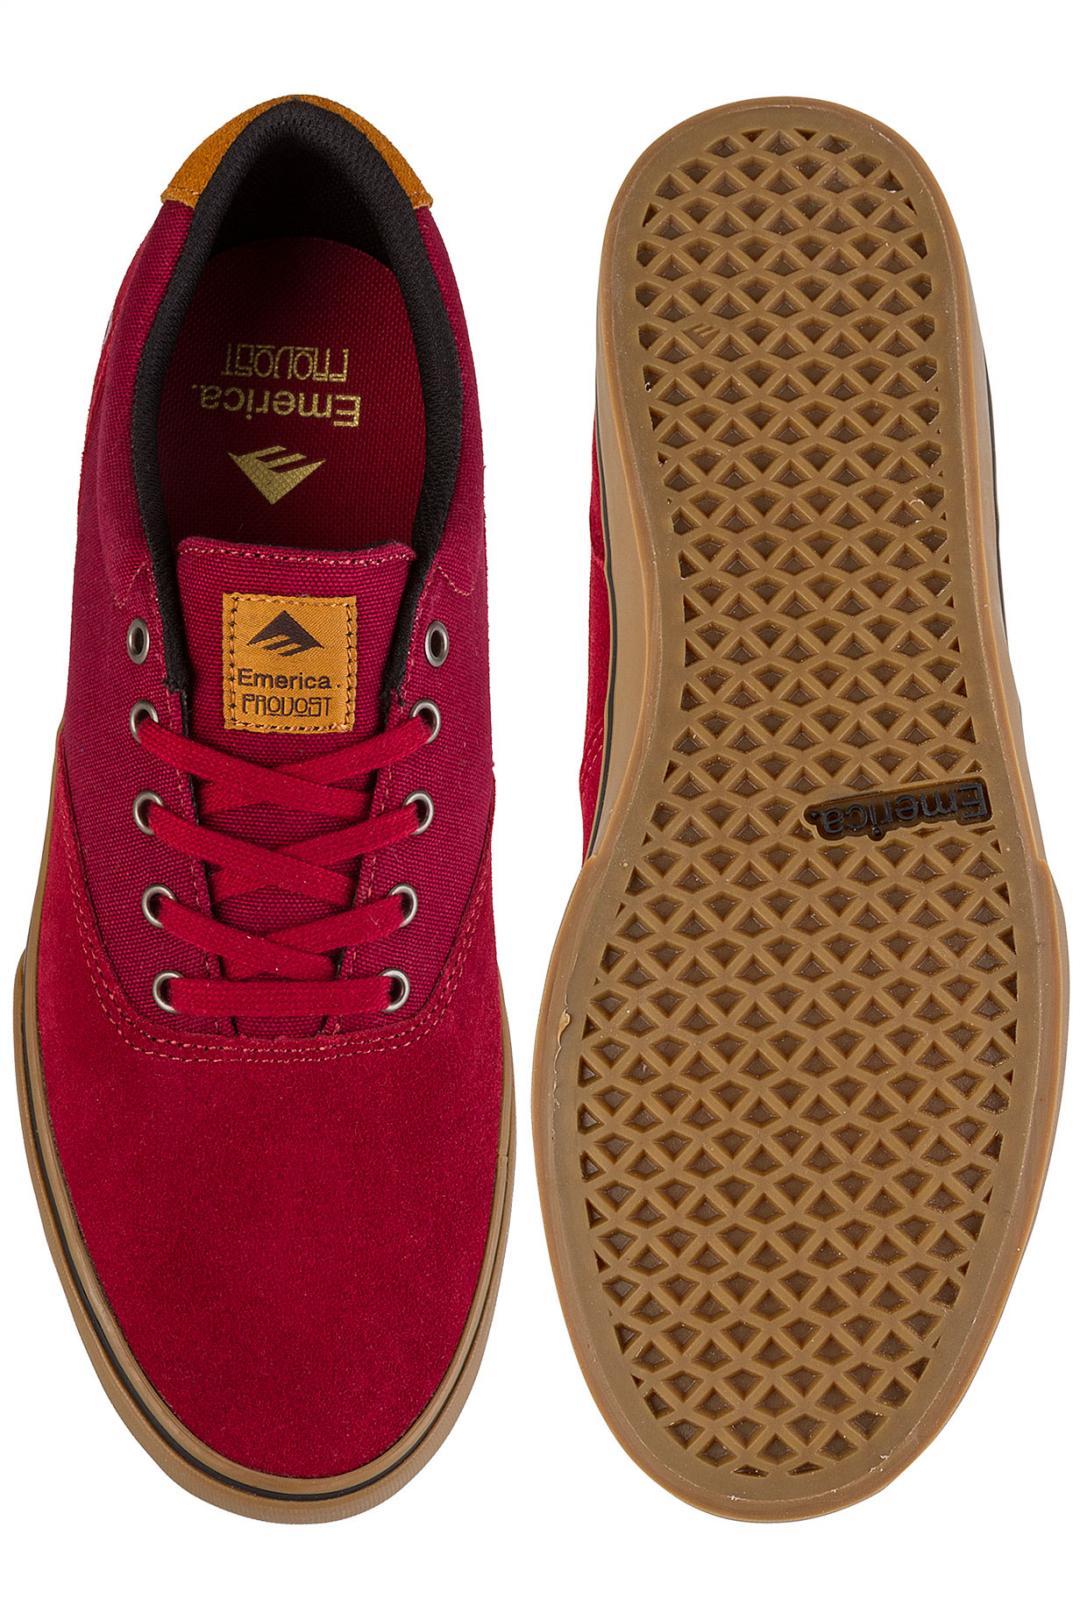 Uomo Emerica The Provost Slim Vulc burgundy gum | Sneaker